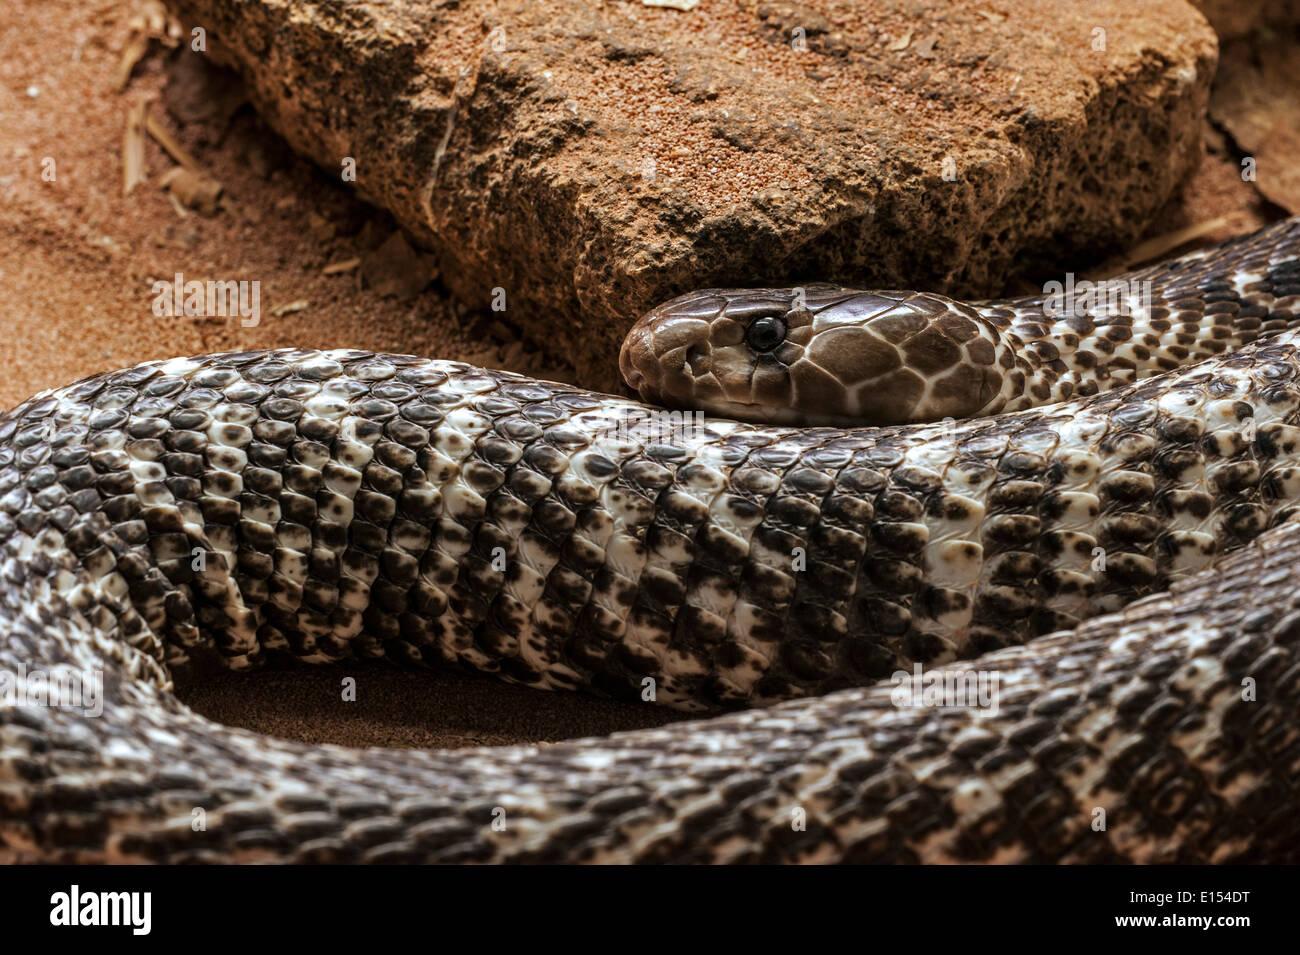 Indian cobra / Spectacled cobra / Asian cobra / Binocellate cobra (Naja naja) curled up, native to India - Stock Image